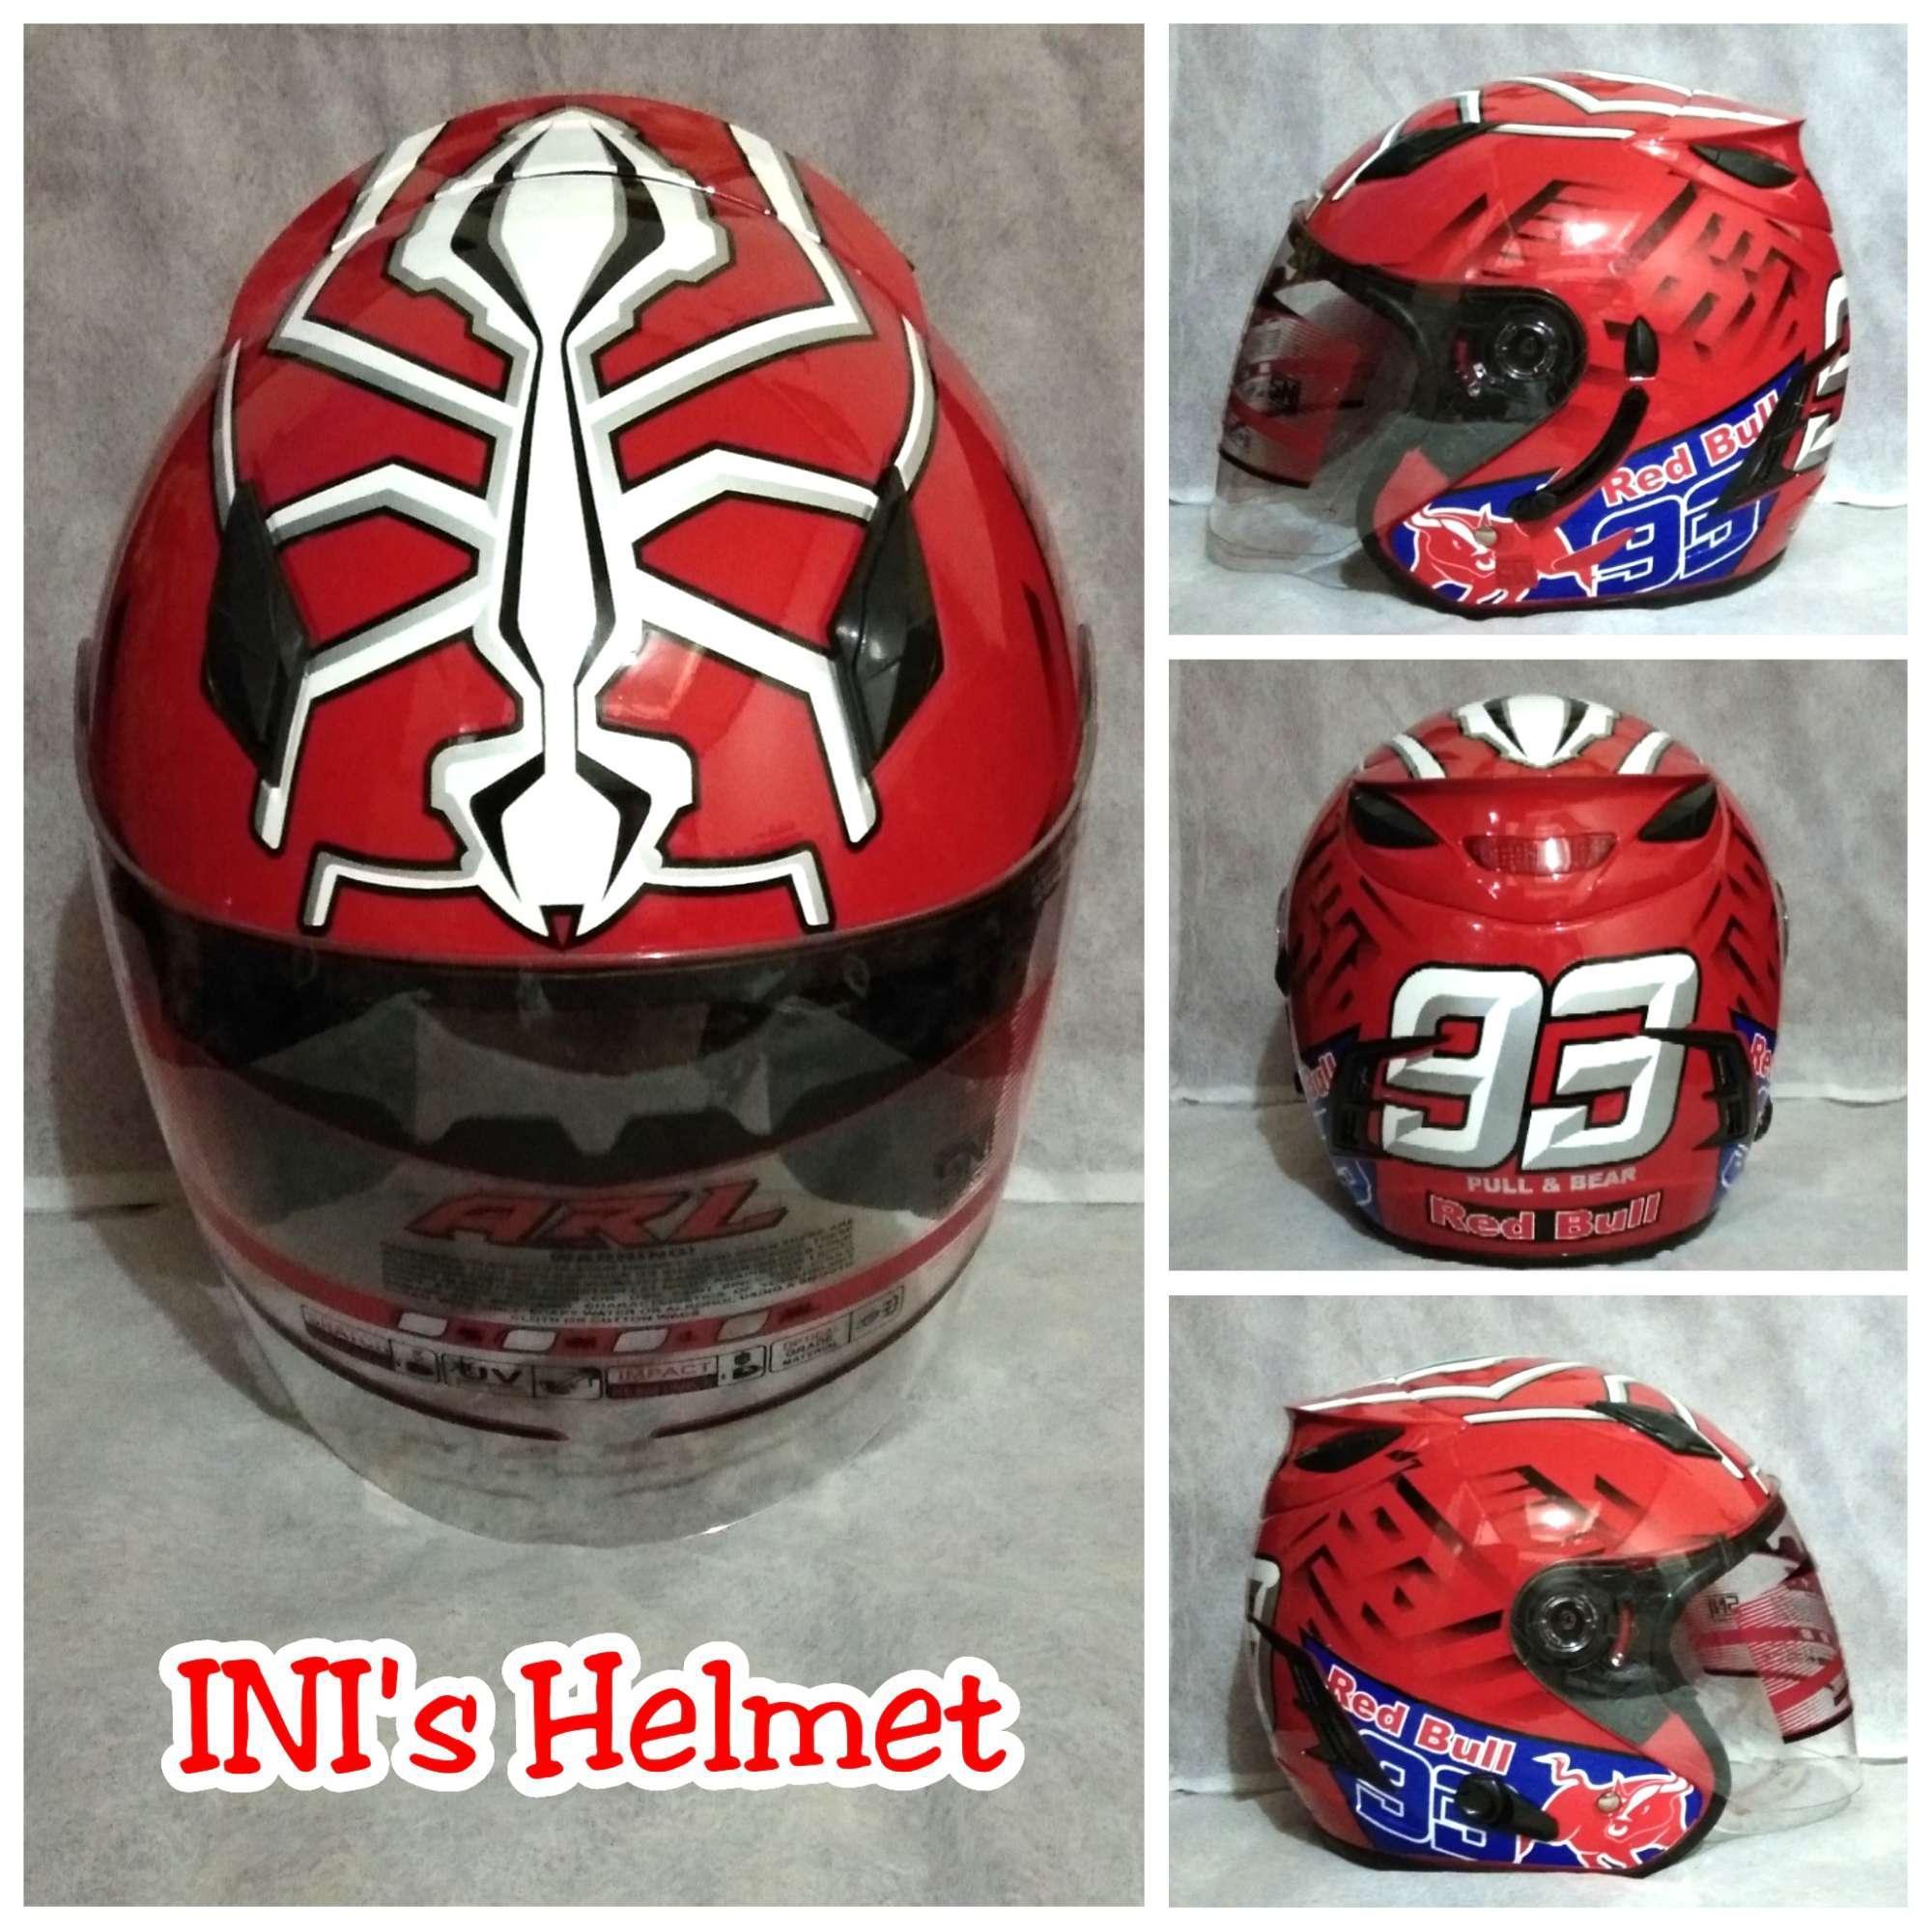 Helm Double Visor (2 Kaca) ARL Motif Merah - Helm SNI